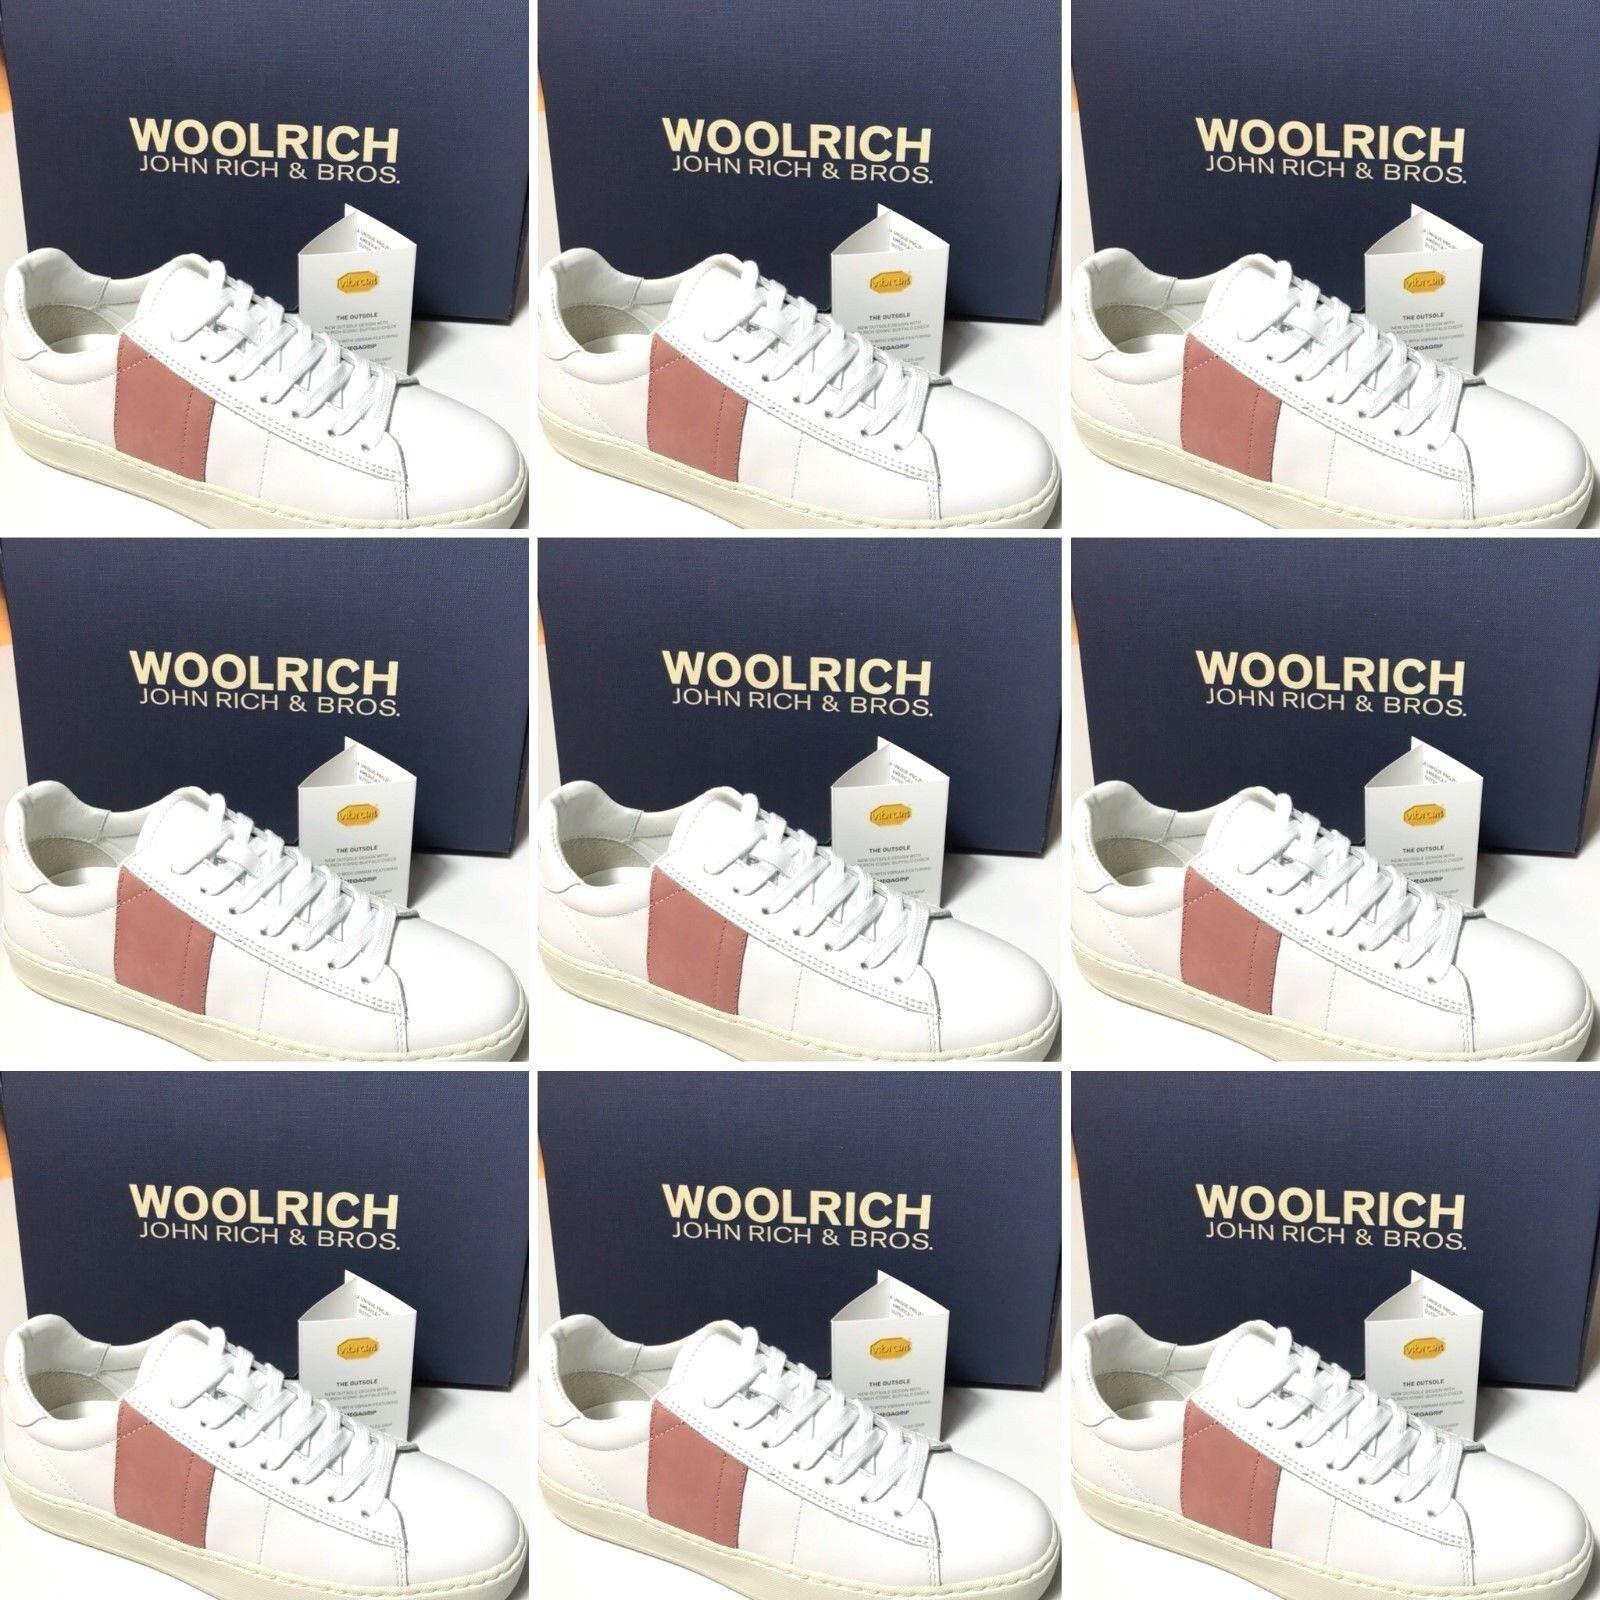 Woolrich Chaussures pour femmes basket ART. W2130W420 leather blanc blanc blanc rose Court b7ec93